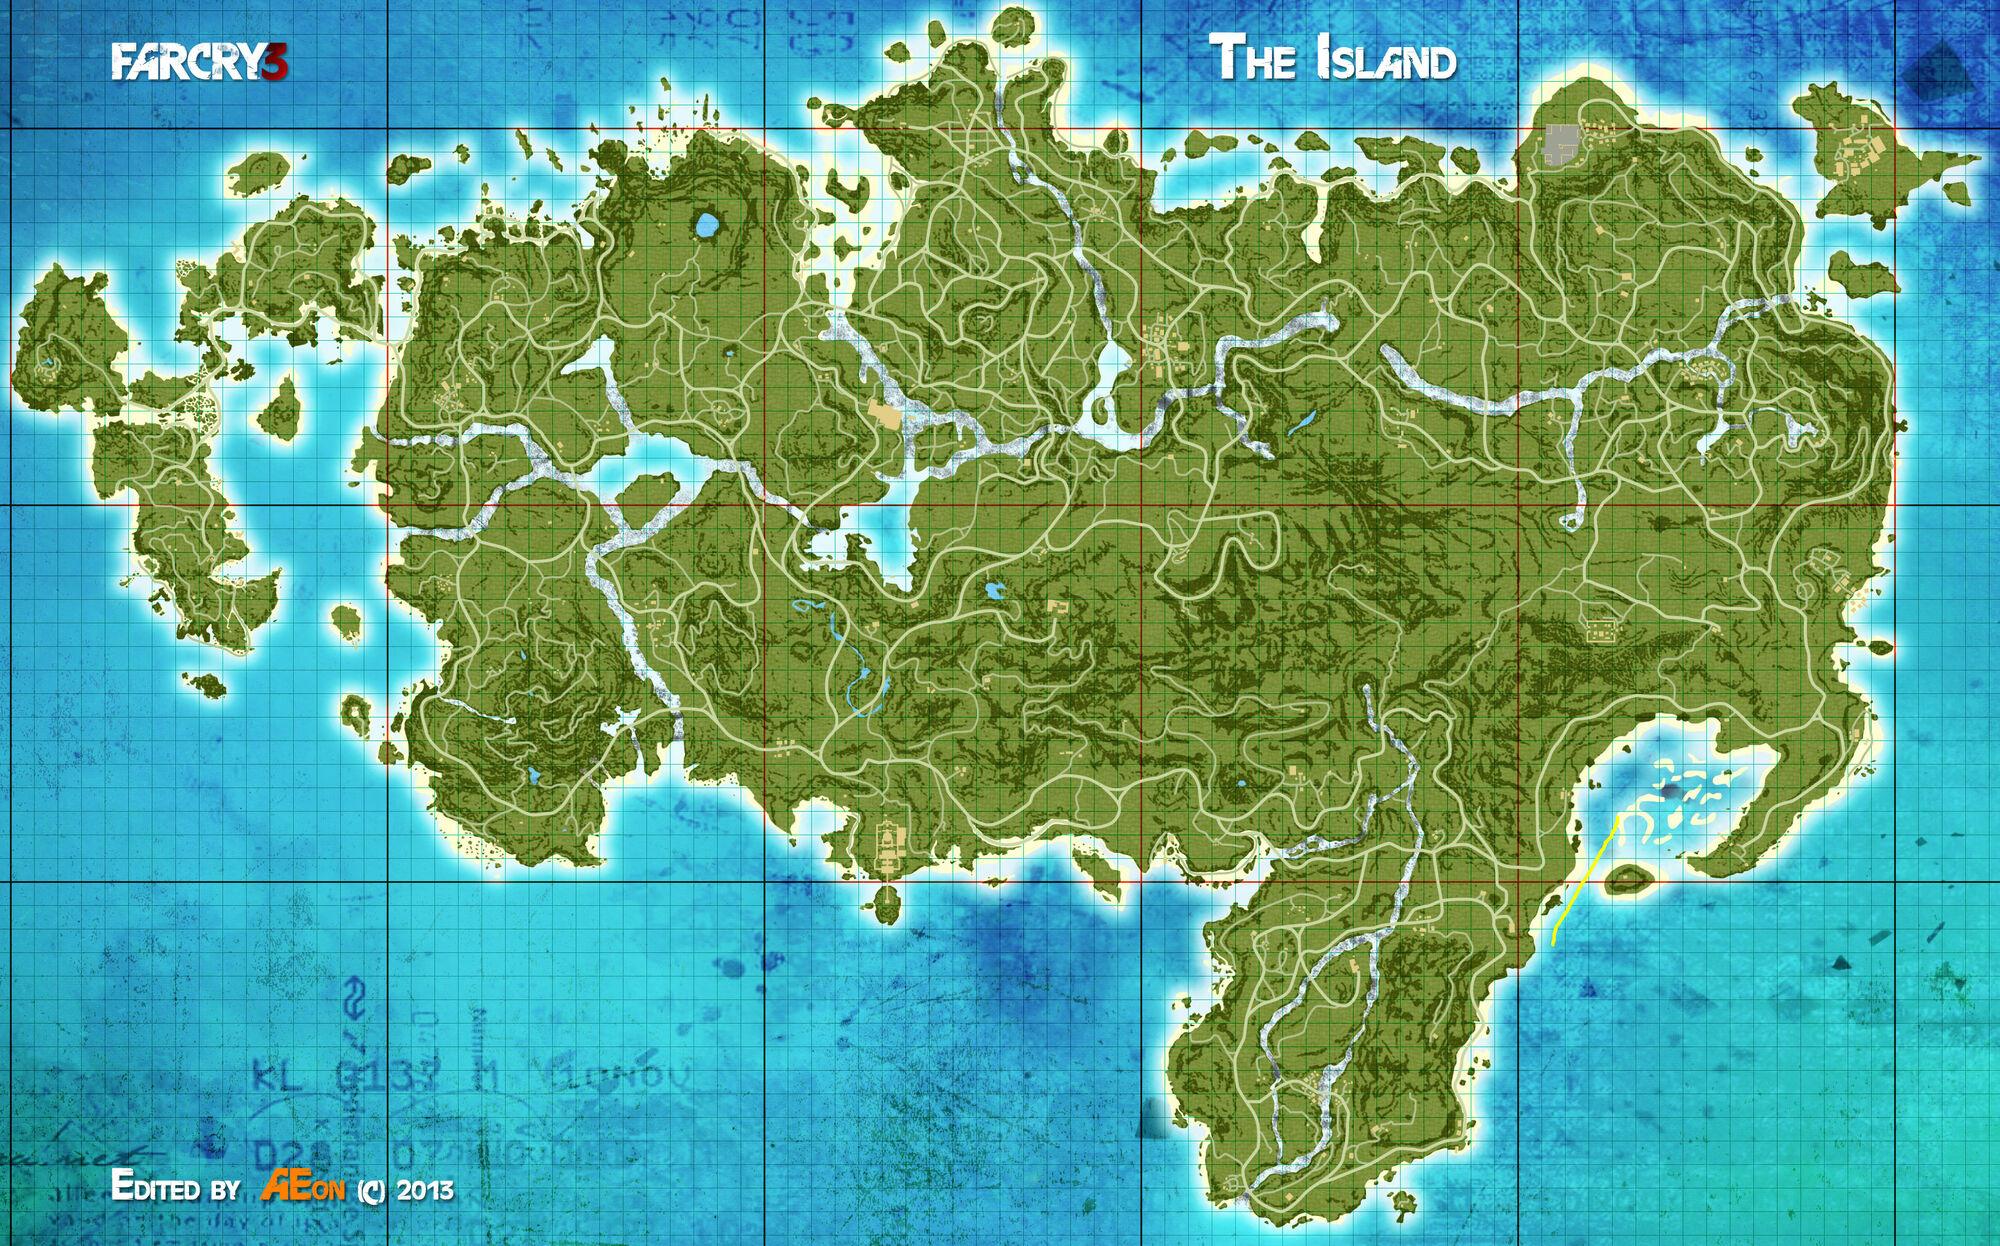 Far Cry 5 Full Map: Image - Far Cry 3 - N-Island - Clean Q60.jpg